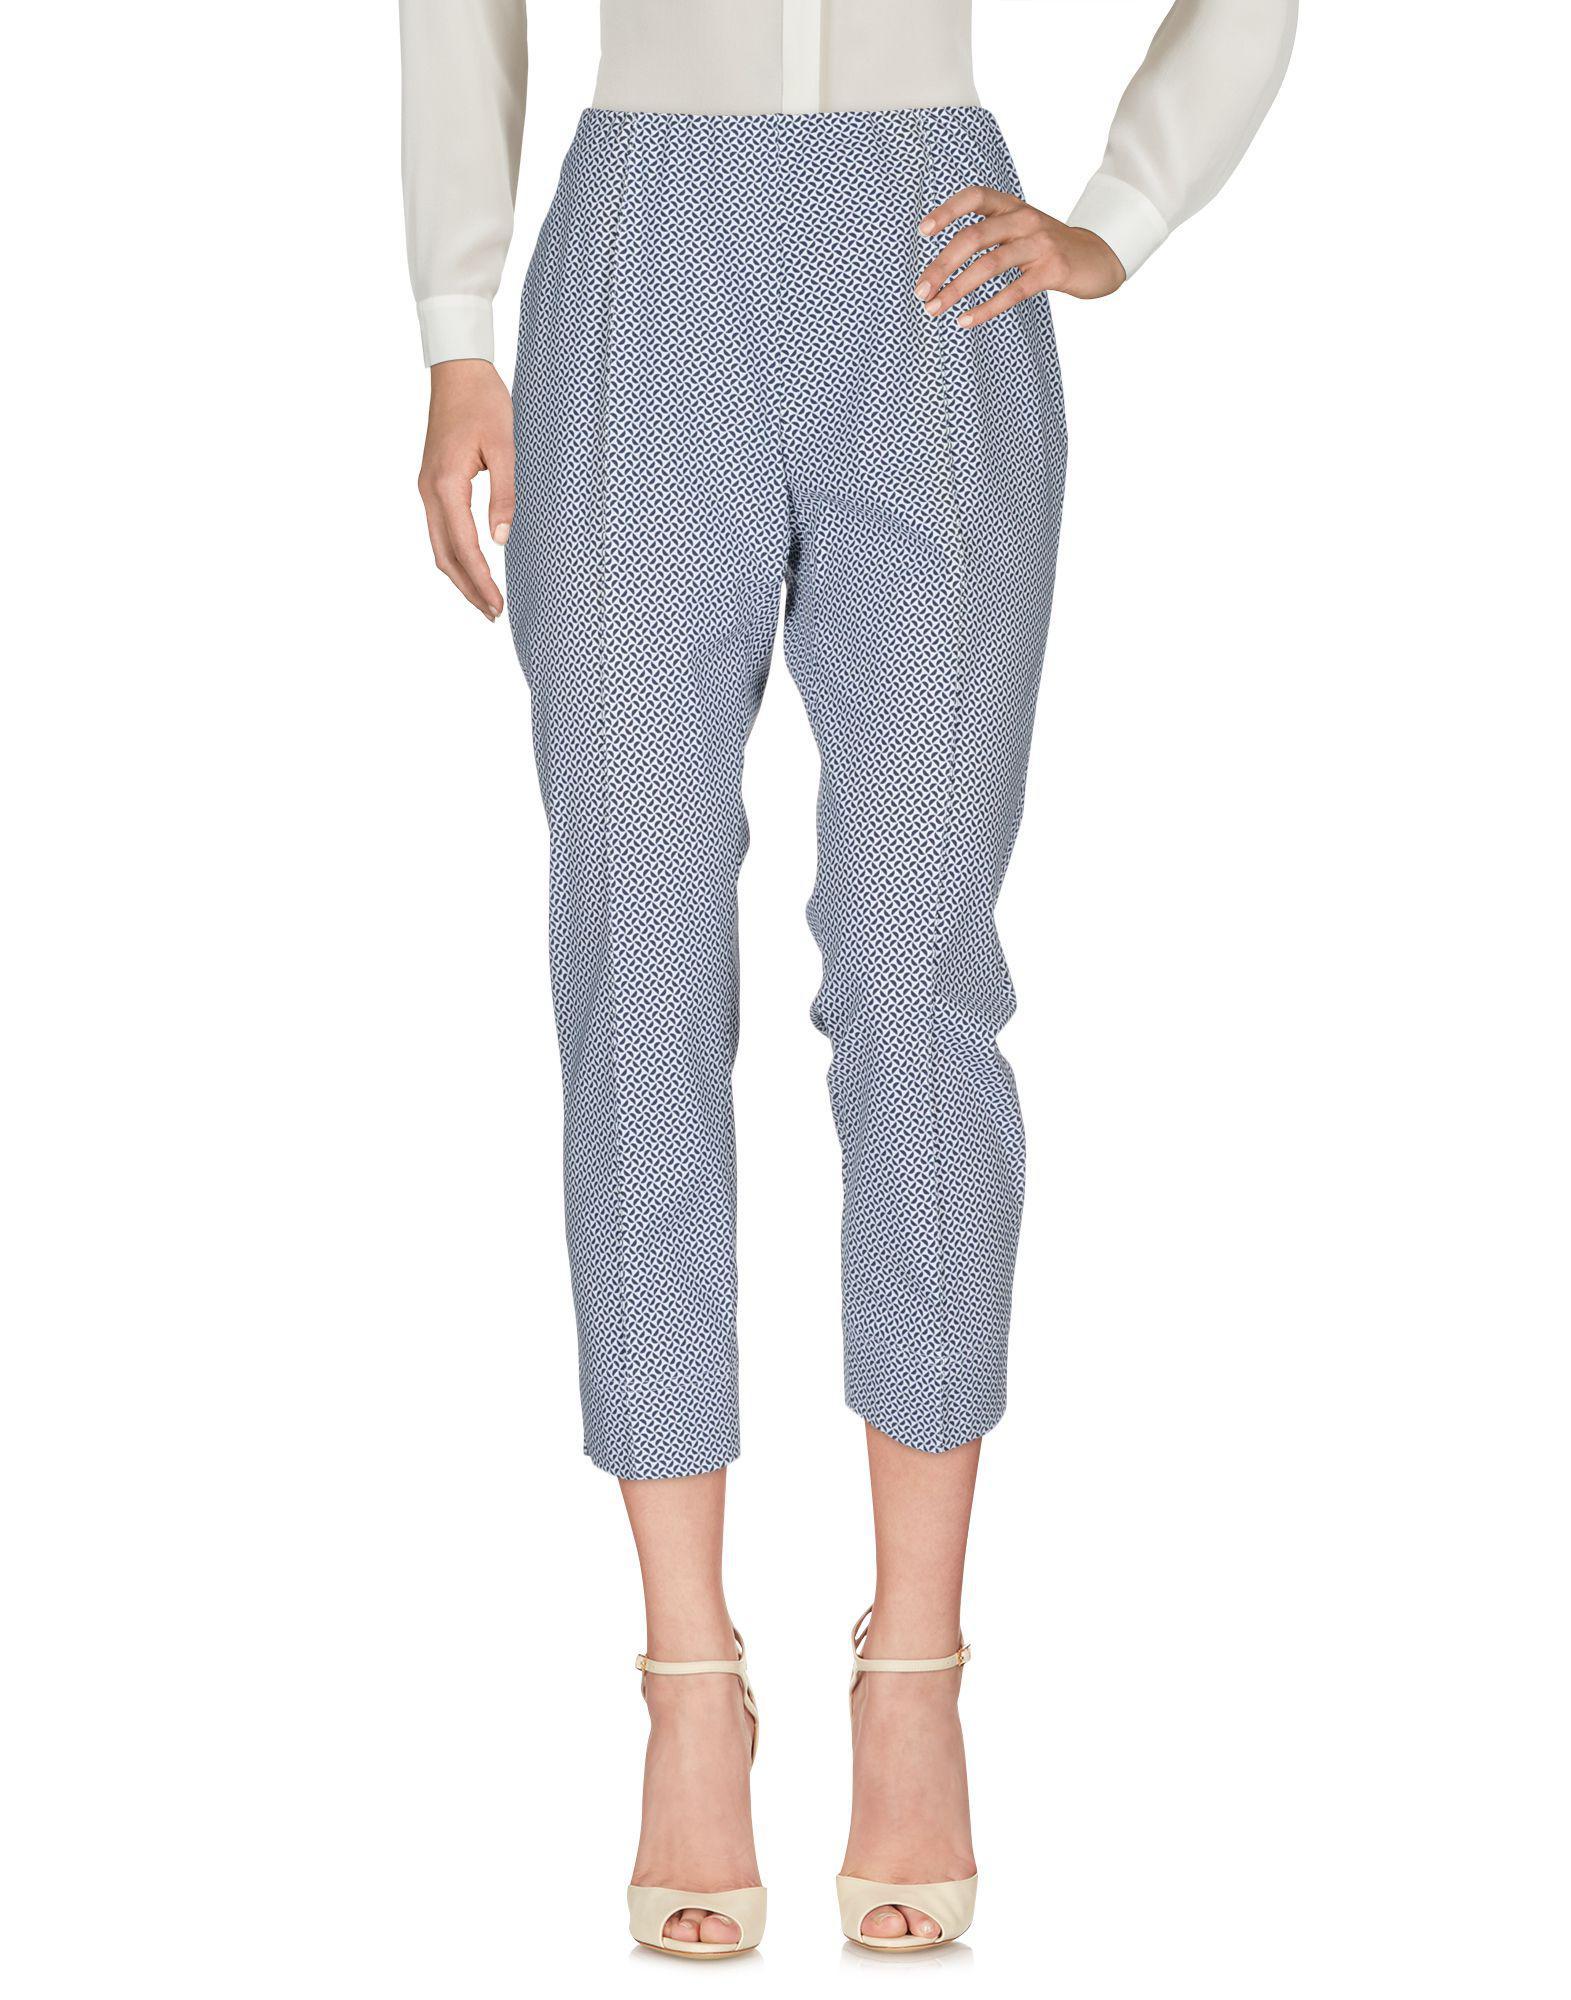 Cheap Fake TROUSERS - Casual trousers Seductive Sast Cheap Online Cheap Sale Buy yNg6L